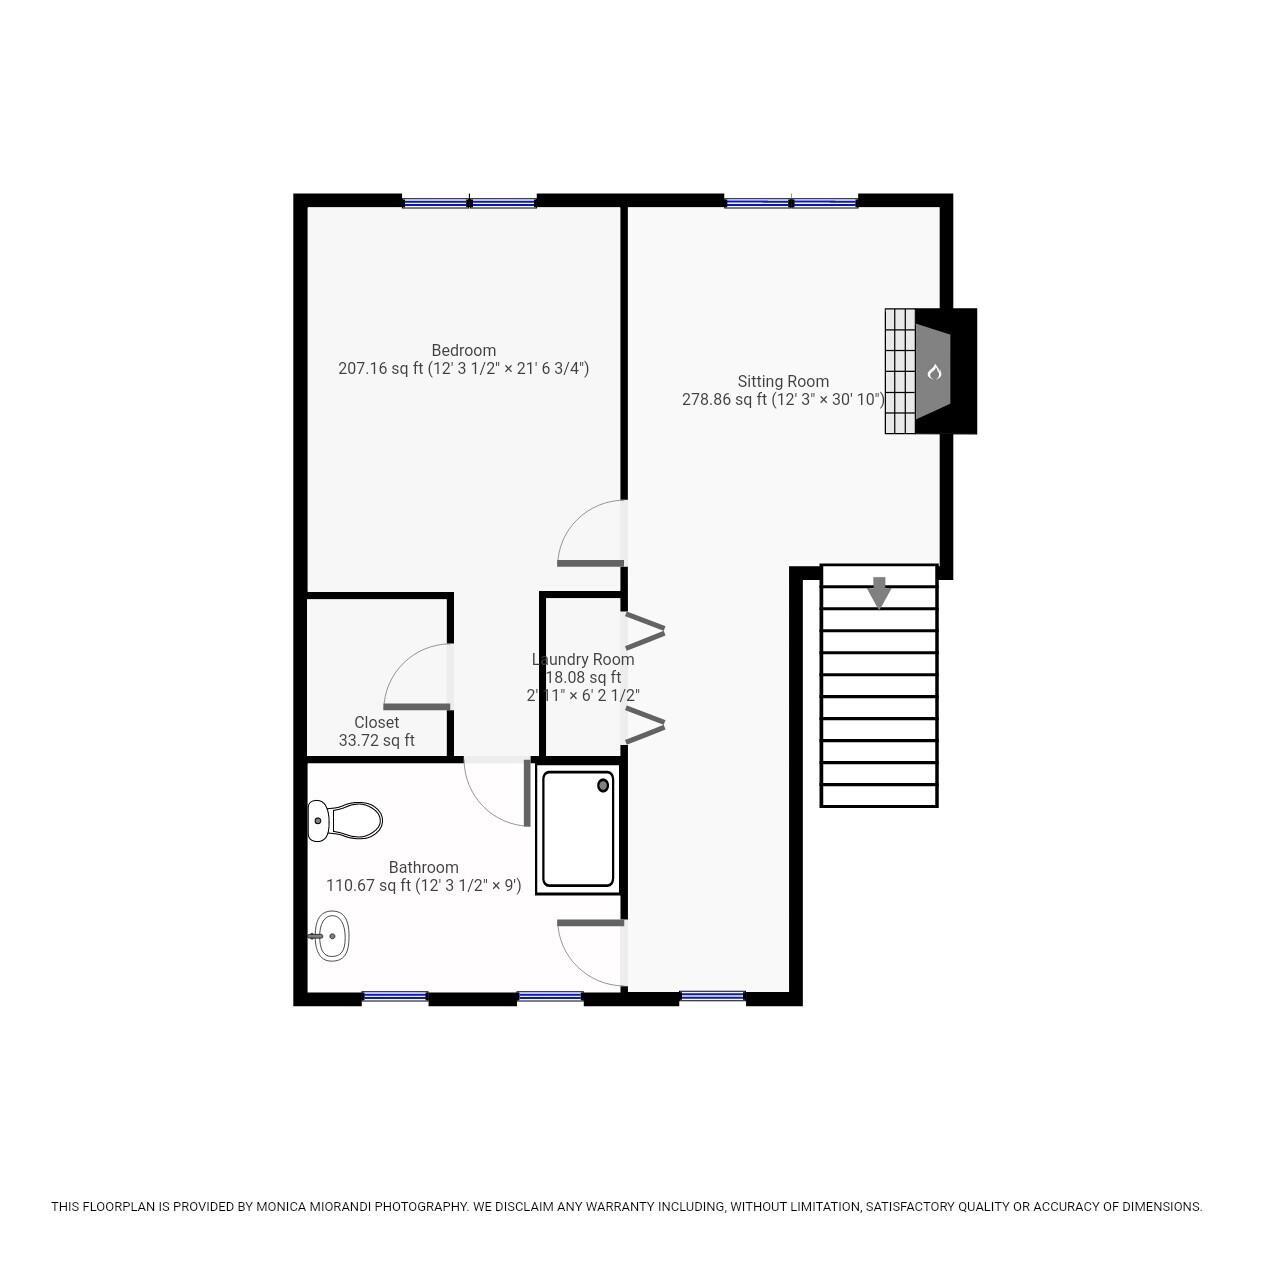 1076 main street chatham ma 02633 property image 34